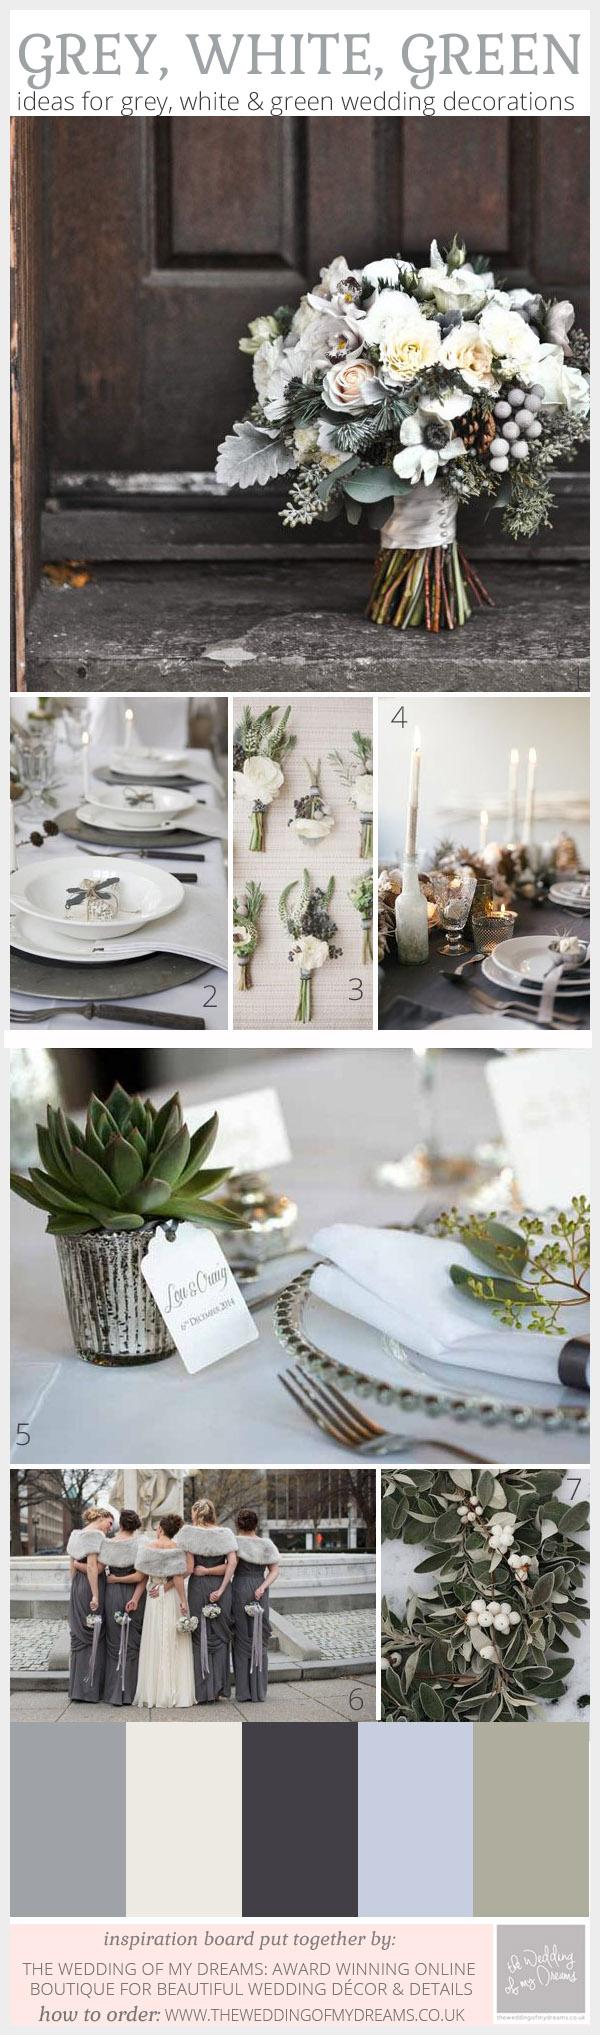 grey white green wedding inspiration board